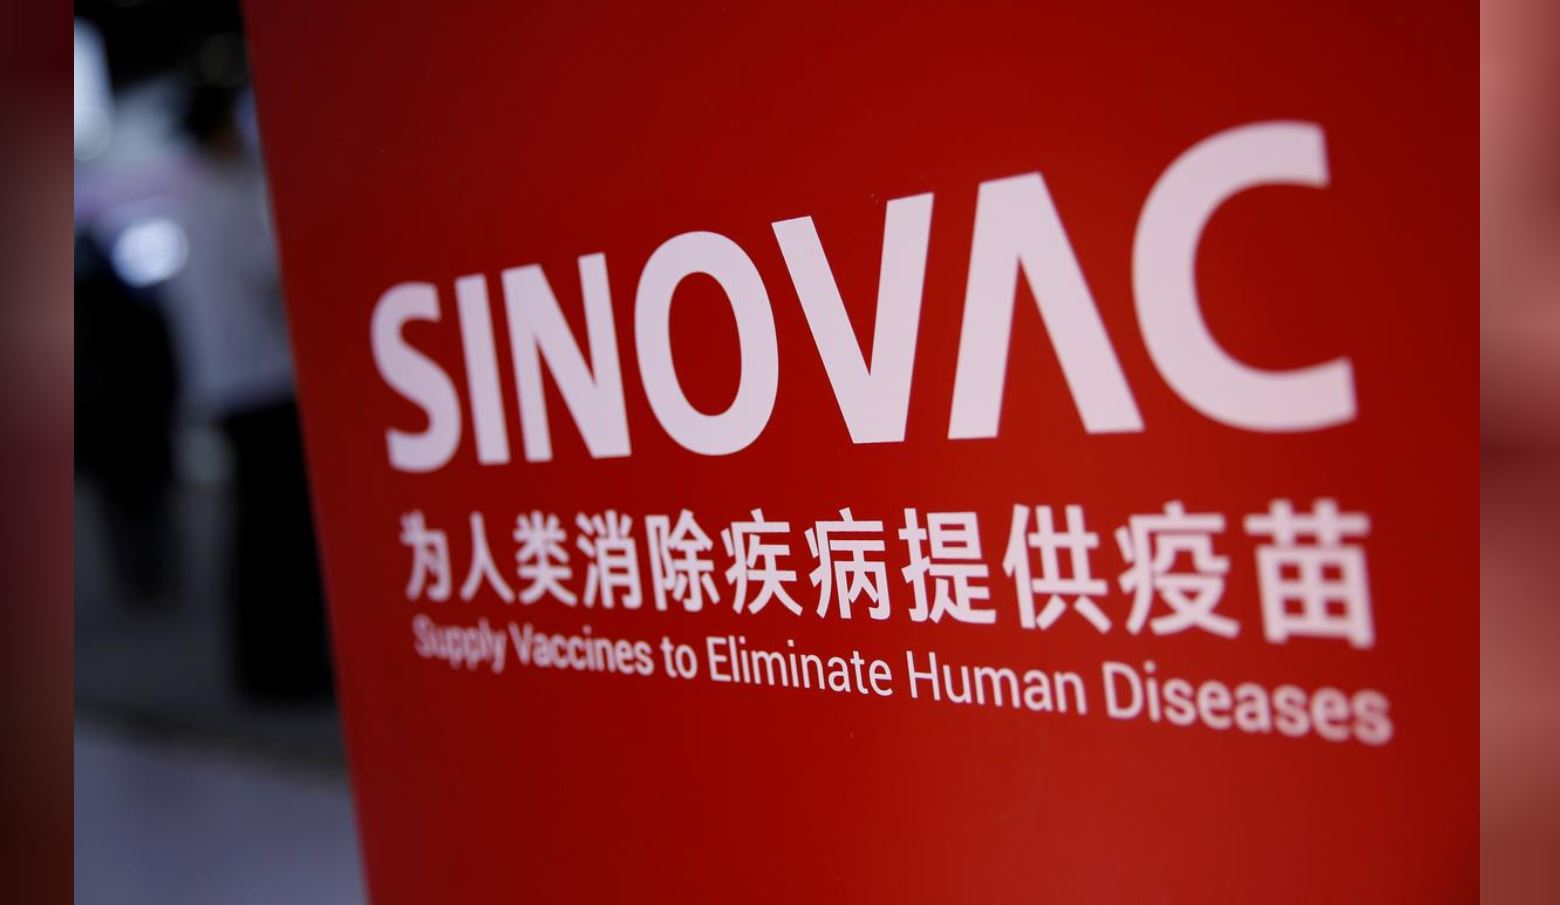 90% of China's Sinovac employees, families took coronavirus vaccine, says CEO